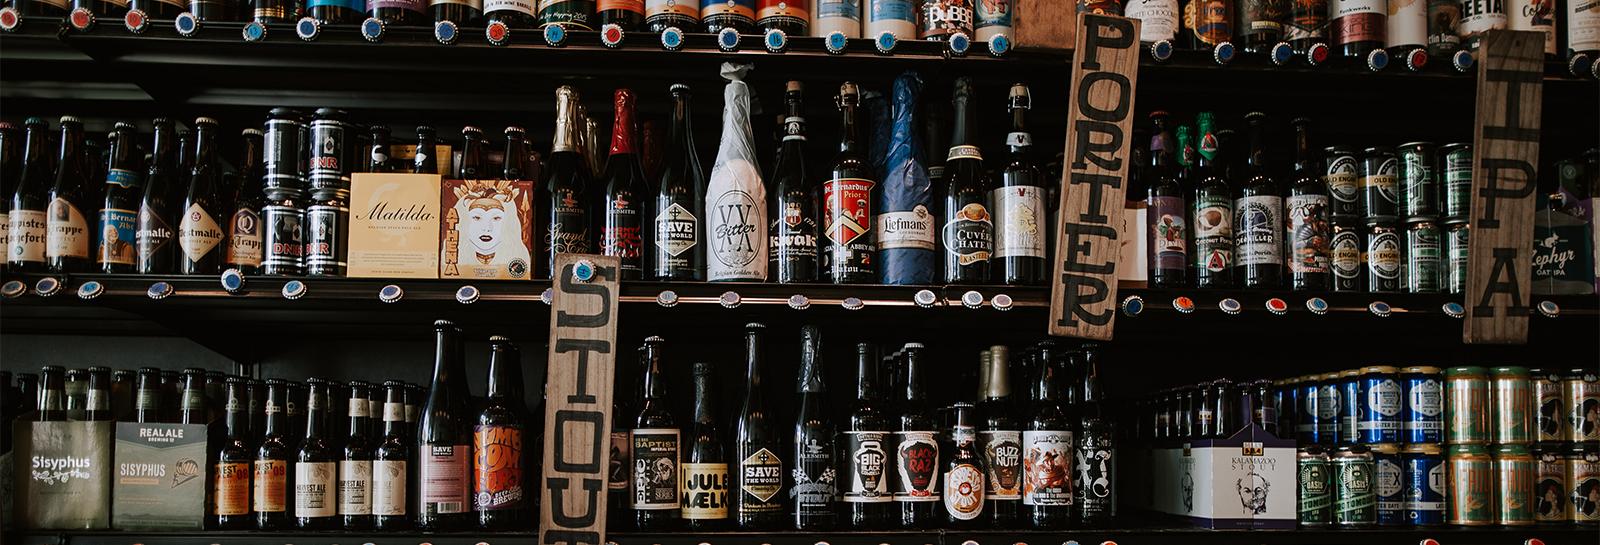 craft beer behind a bar